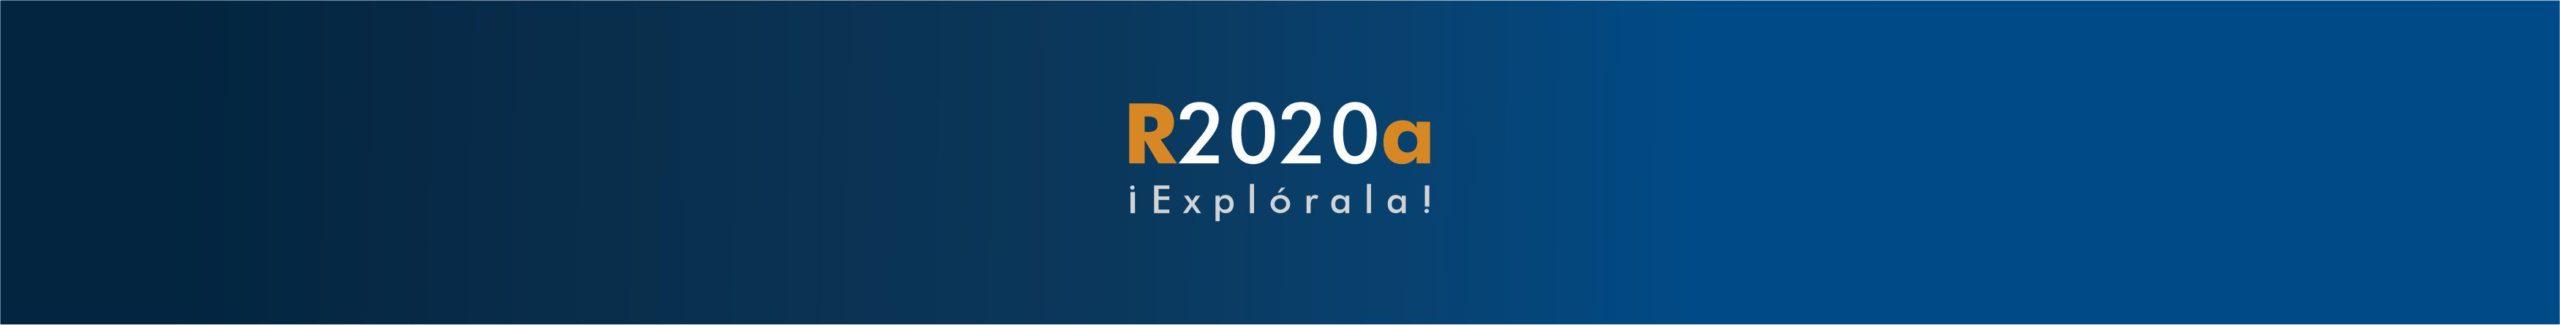 r2020